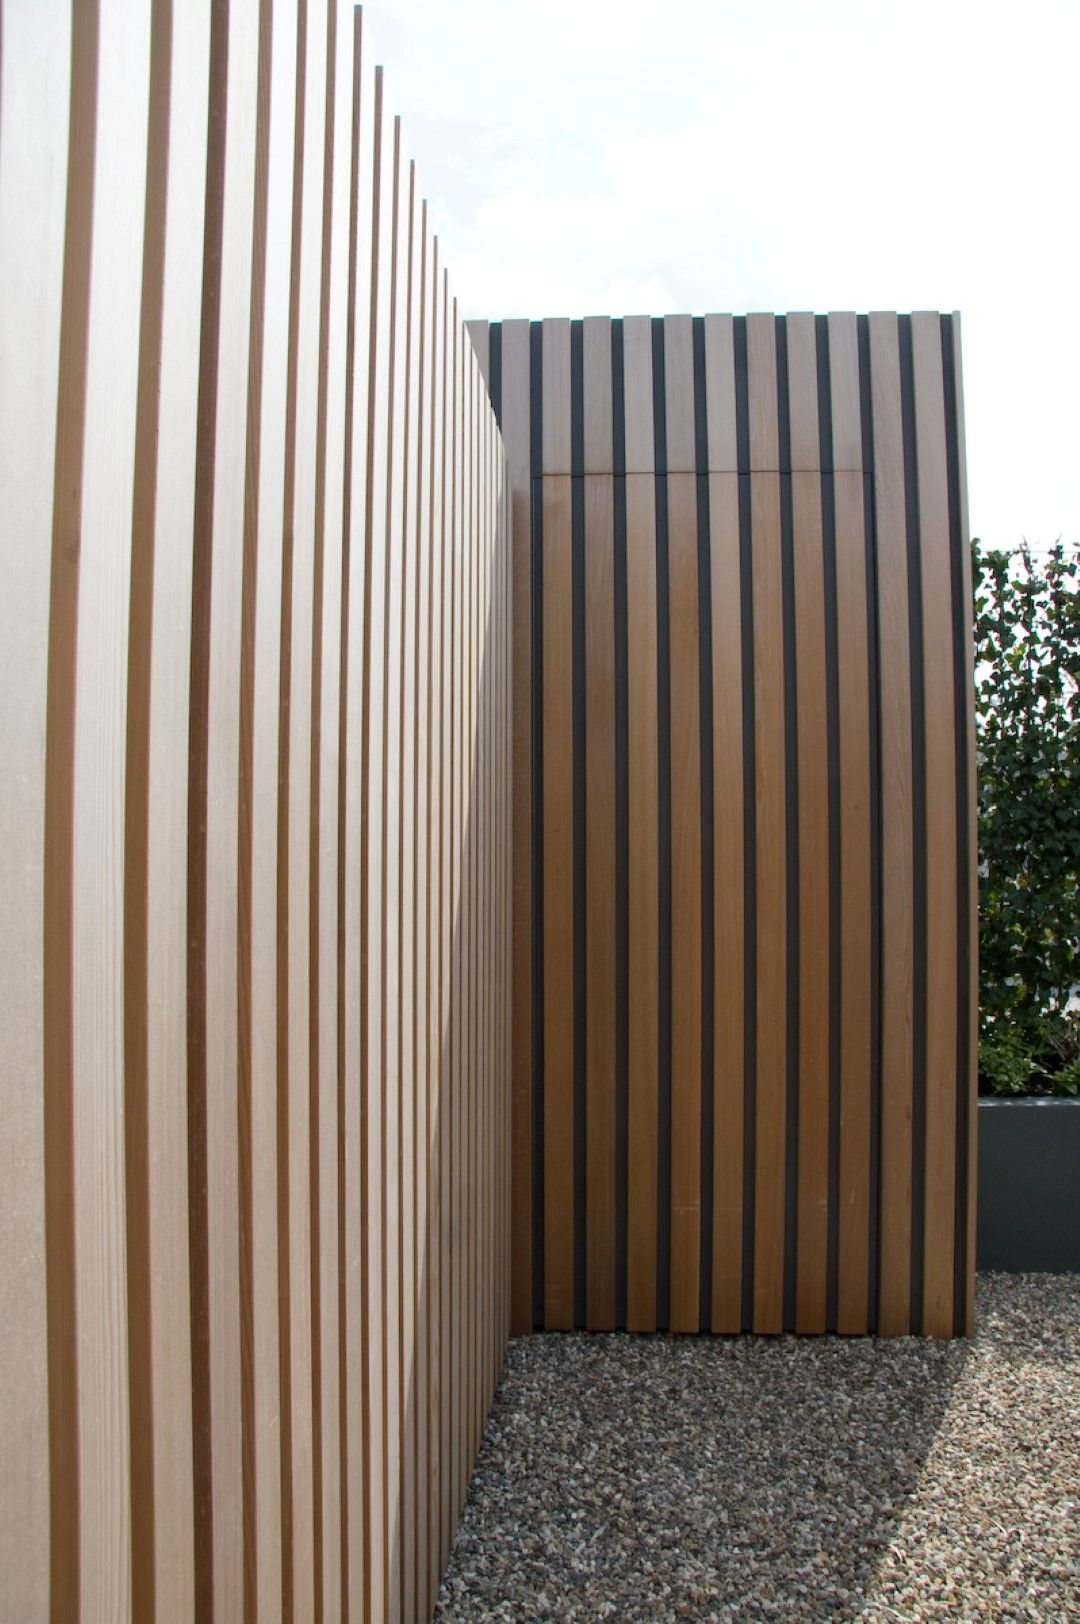 Cover Concrete Block With Vertical Slats Paint Wall Deep Grey Then Use Natural Stained Cedar On Top Achtertuin Hekken Modern Hek Daktuinen